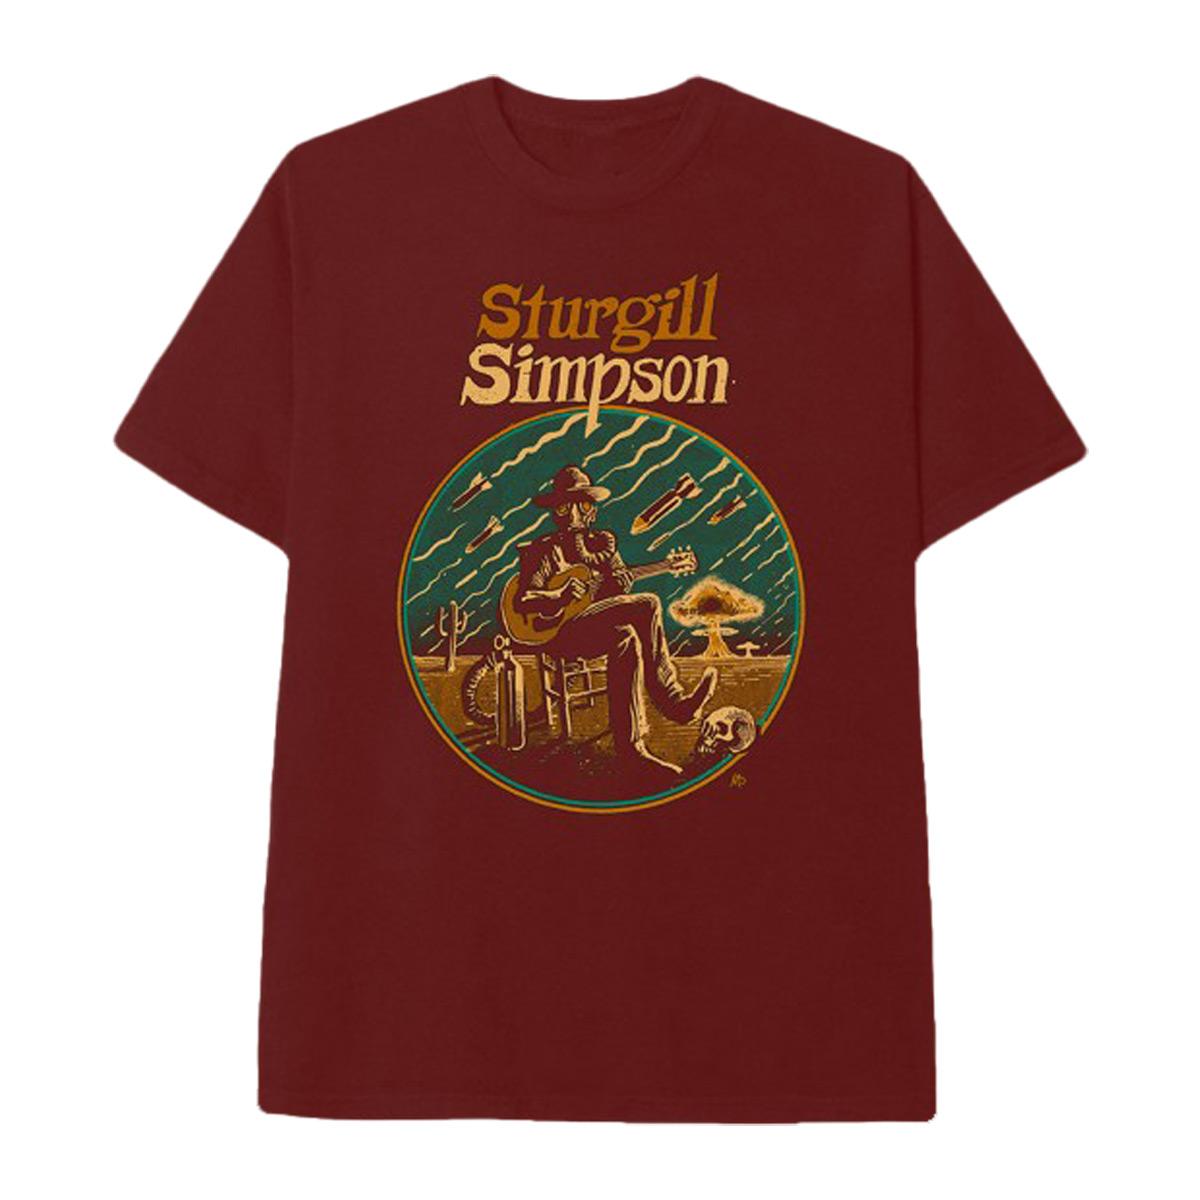 Sturgill Simpson Illustration Dateback T-shirt